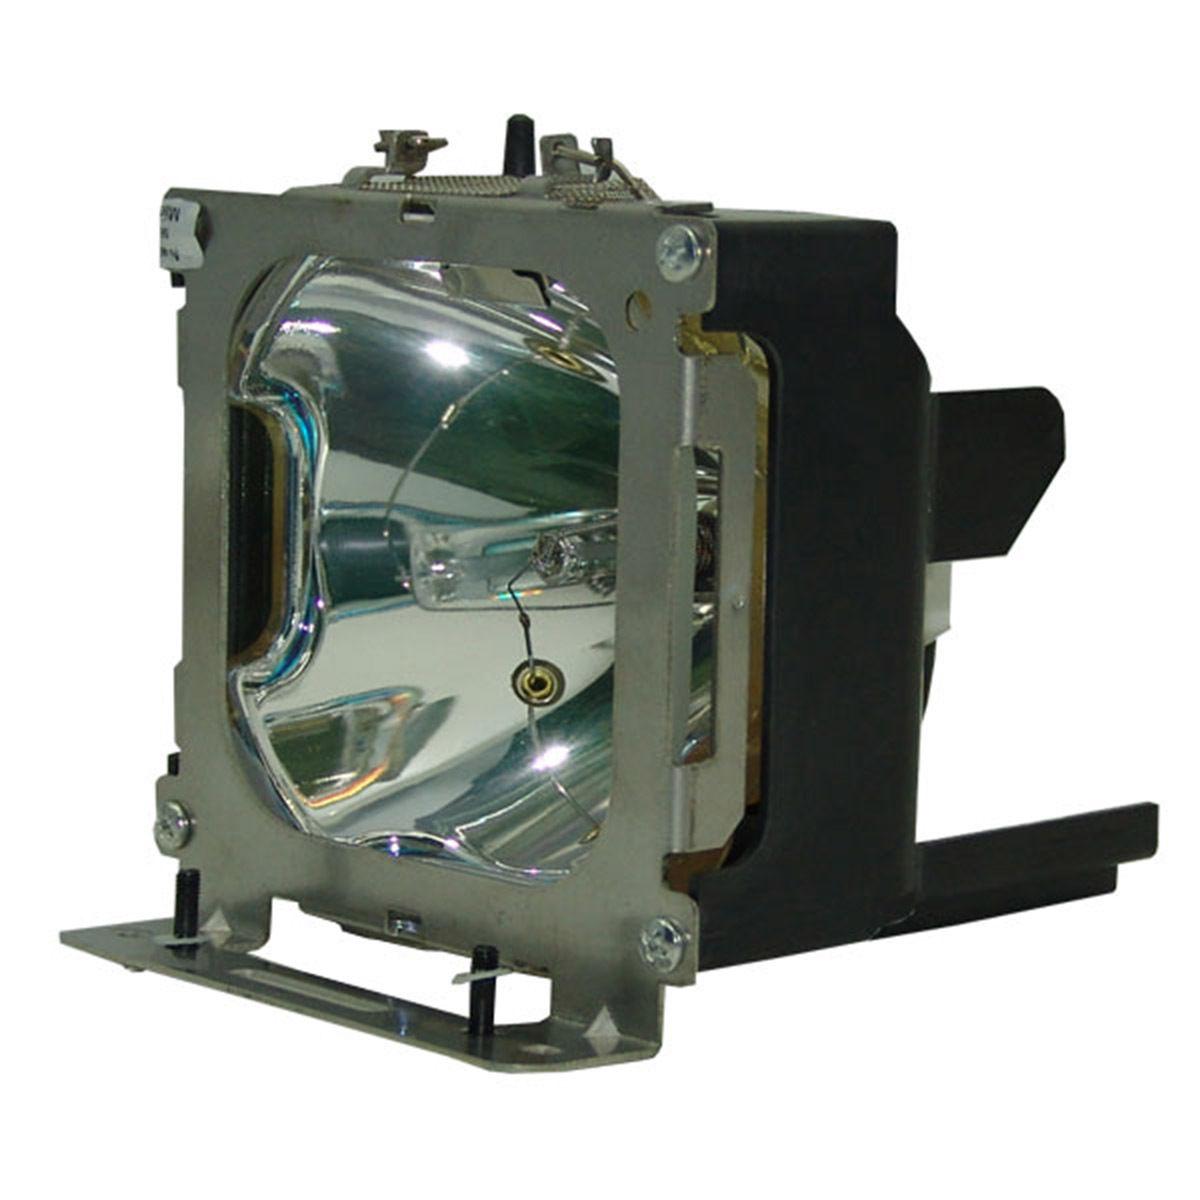 Projector Lamp Bulb RLC-044 RLC044 for VIEWSONIC PJL9250 PJL9300W PJL9520 with housing projector lamp bulb rlc 013 rlc013 lamp